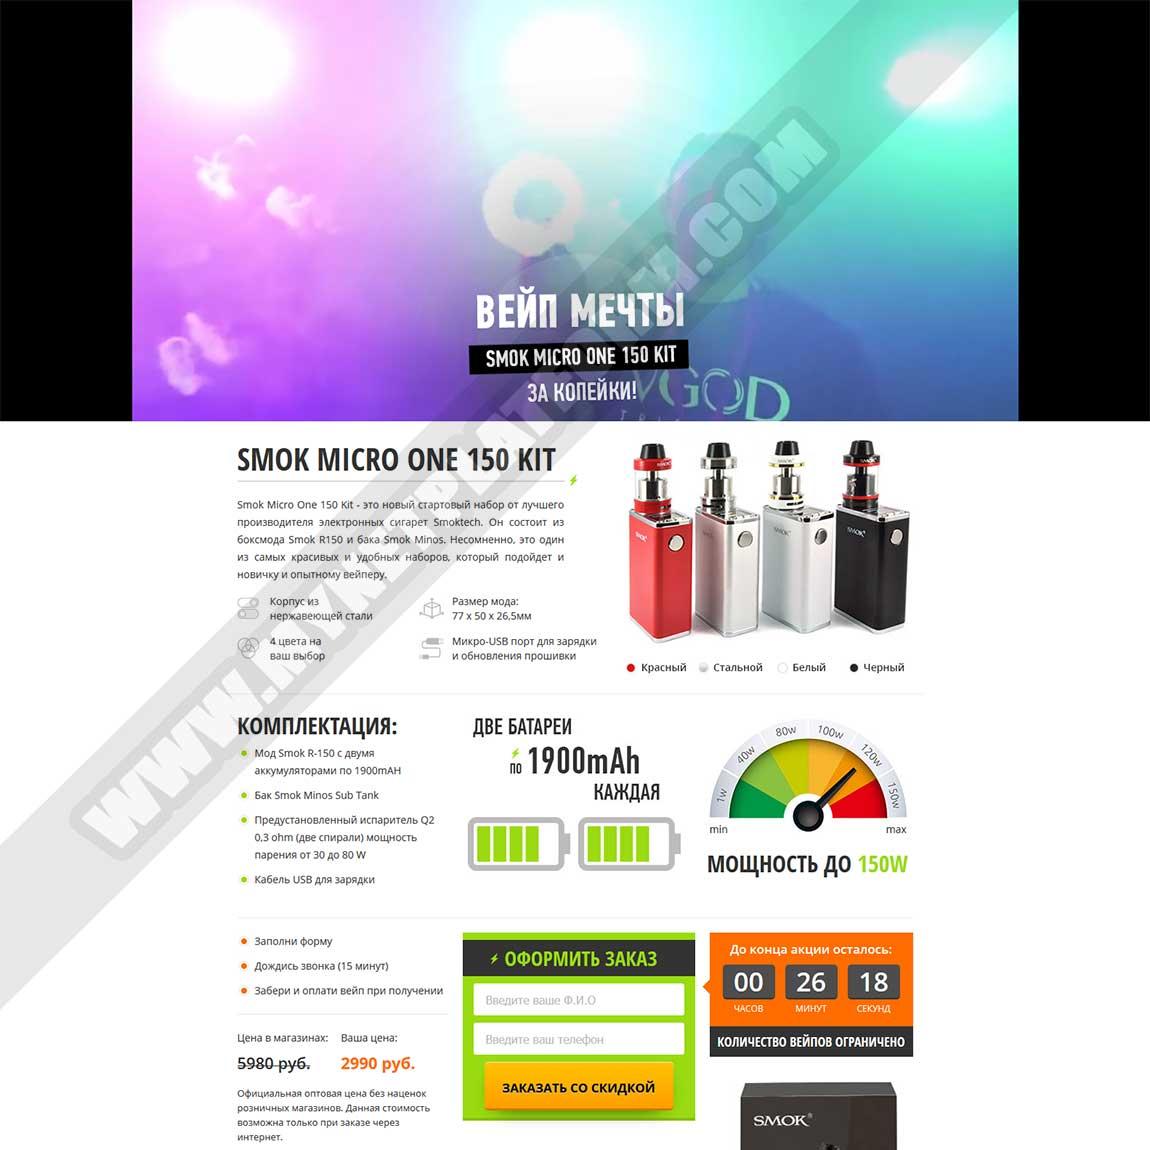 Миниатюра Готового лендинга SMOK Micro one 150 Kit - стартовый набор от Smoktech 001